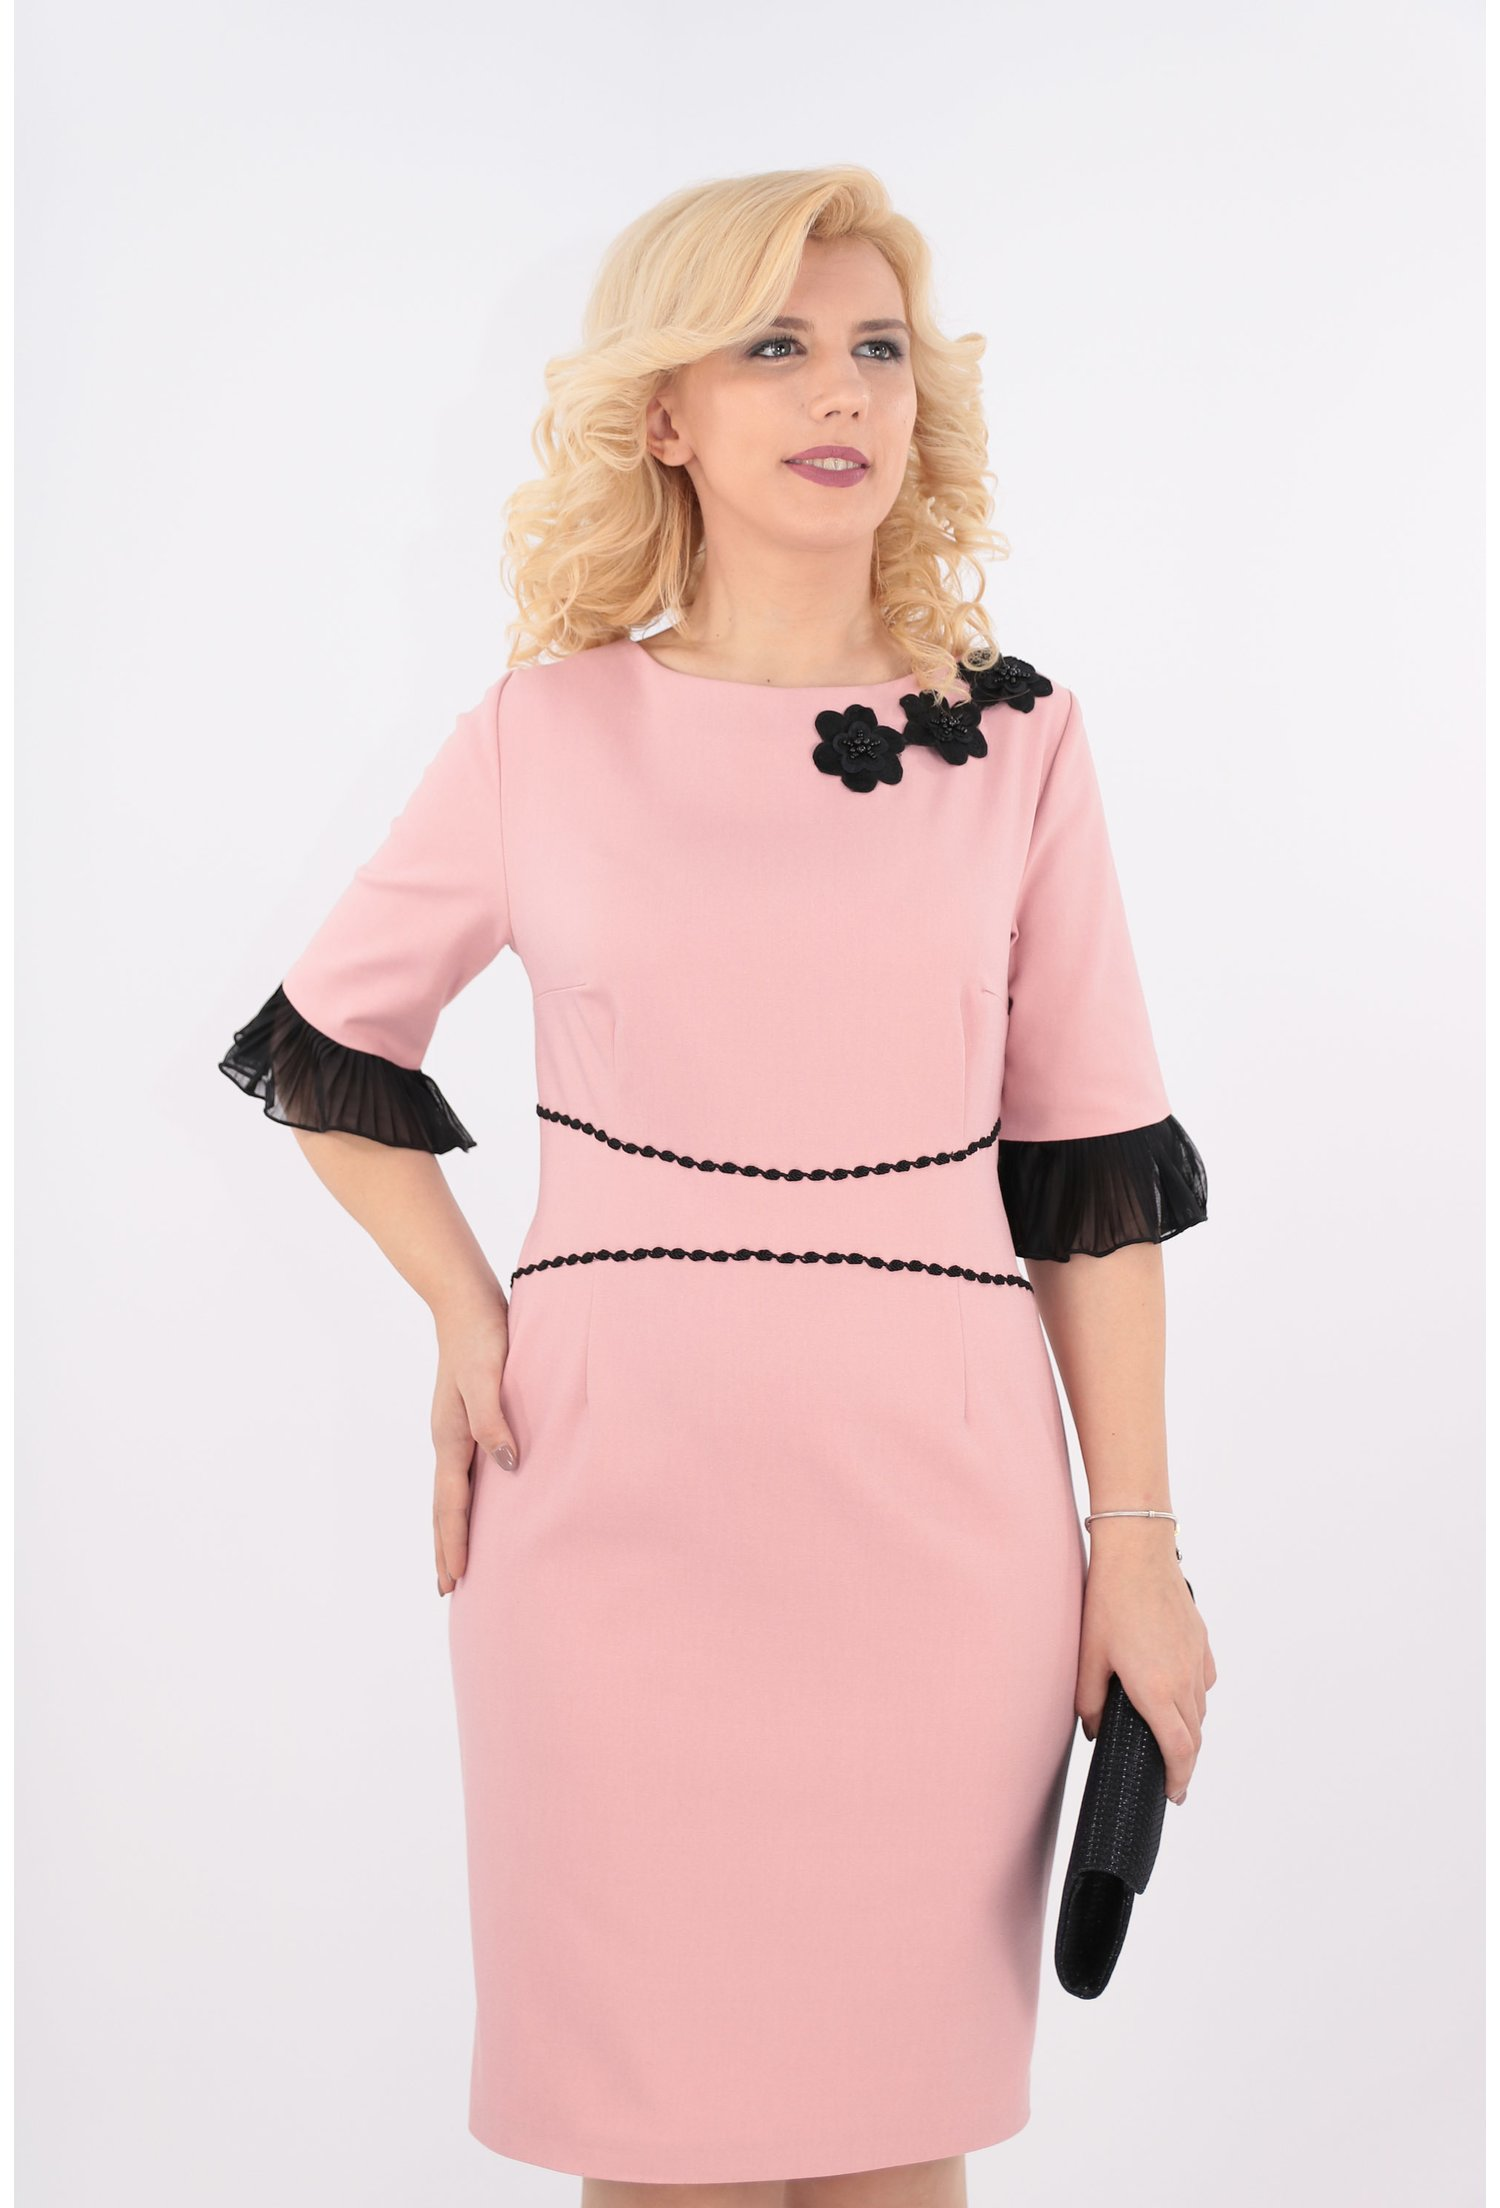 Rochie roz pudra cu banda decorativa neagra